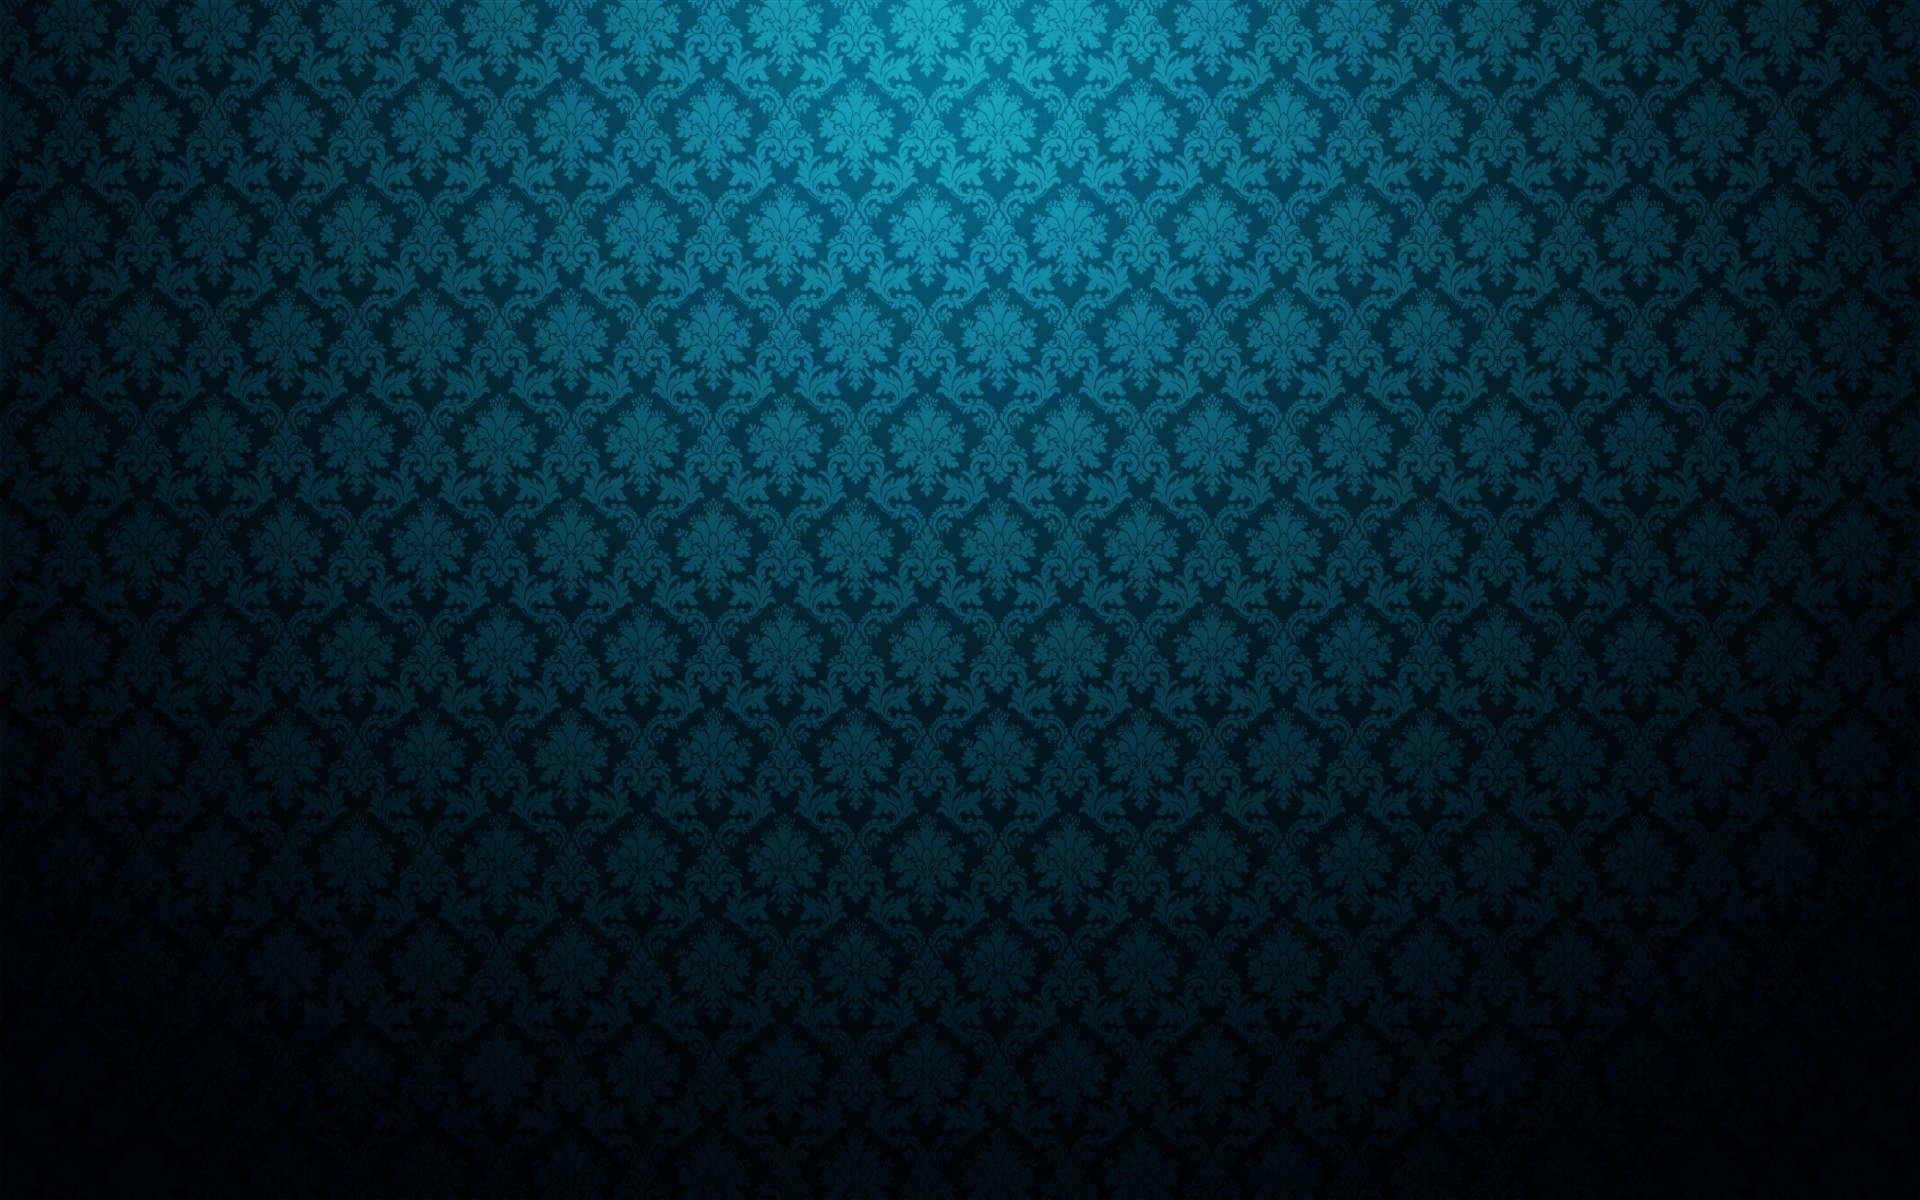 Wallpapers room com   elegant blue wallpaper by blok5 1920x1200jpg 1920x1200